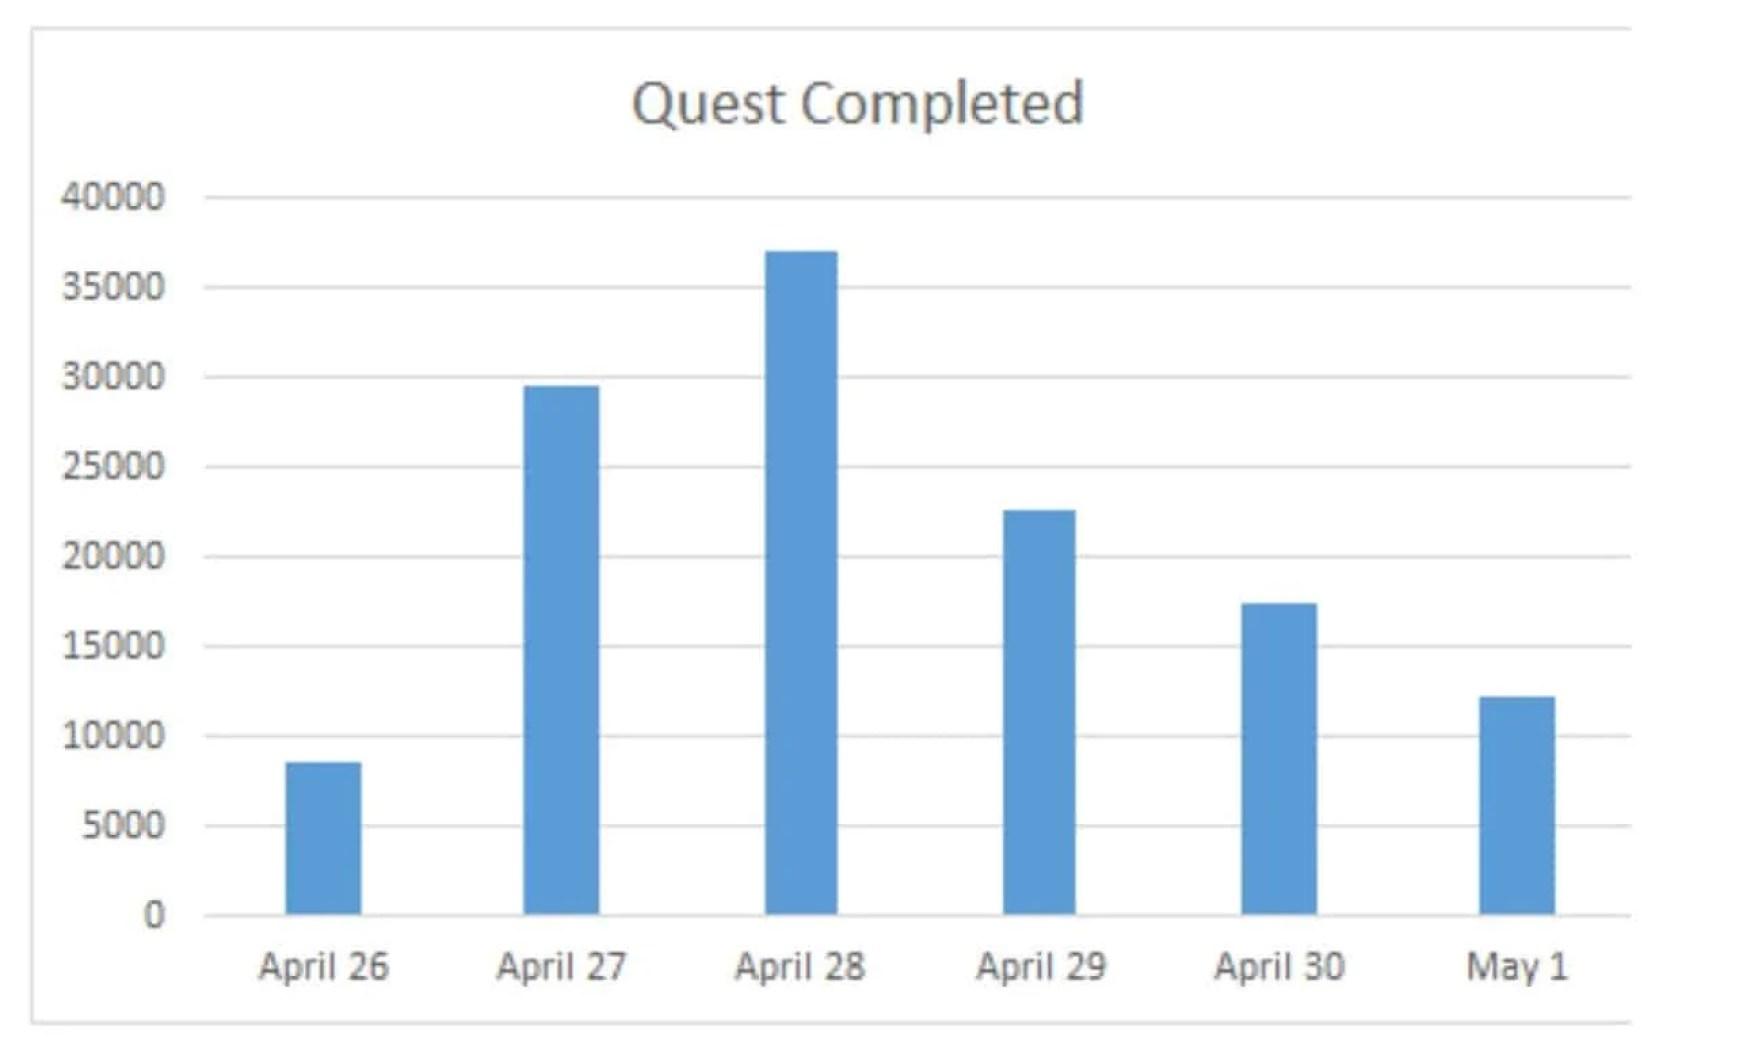 Quest Complete - Bug Bash